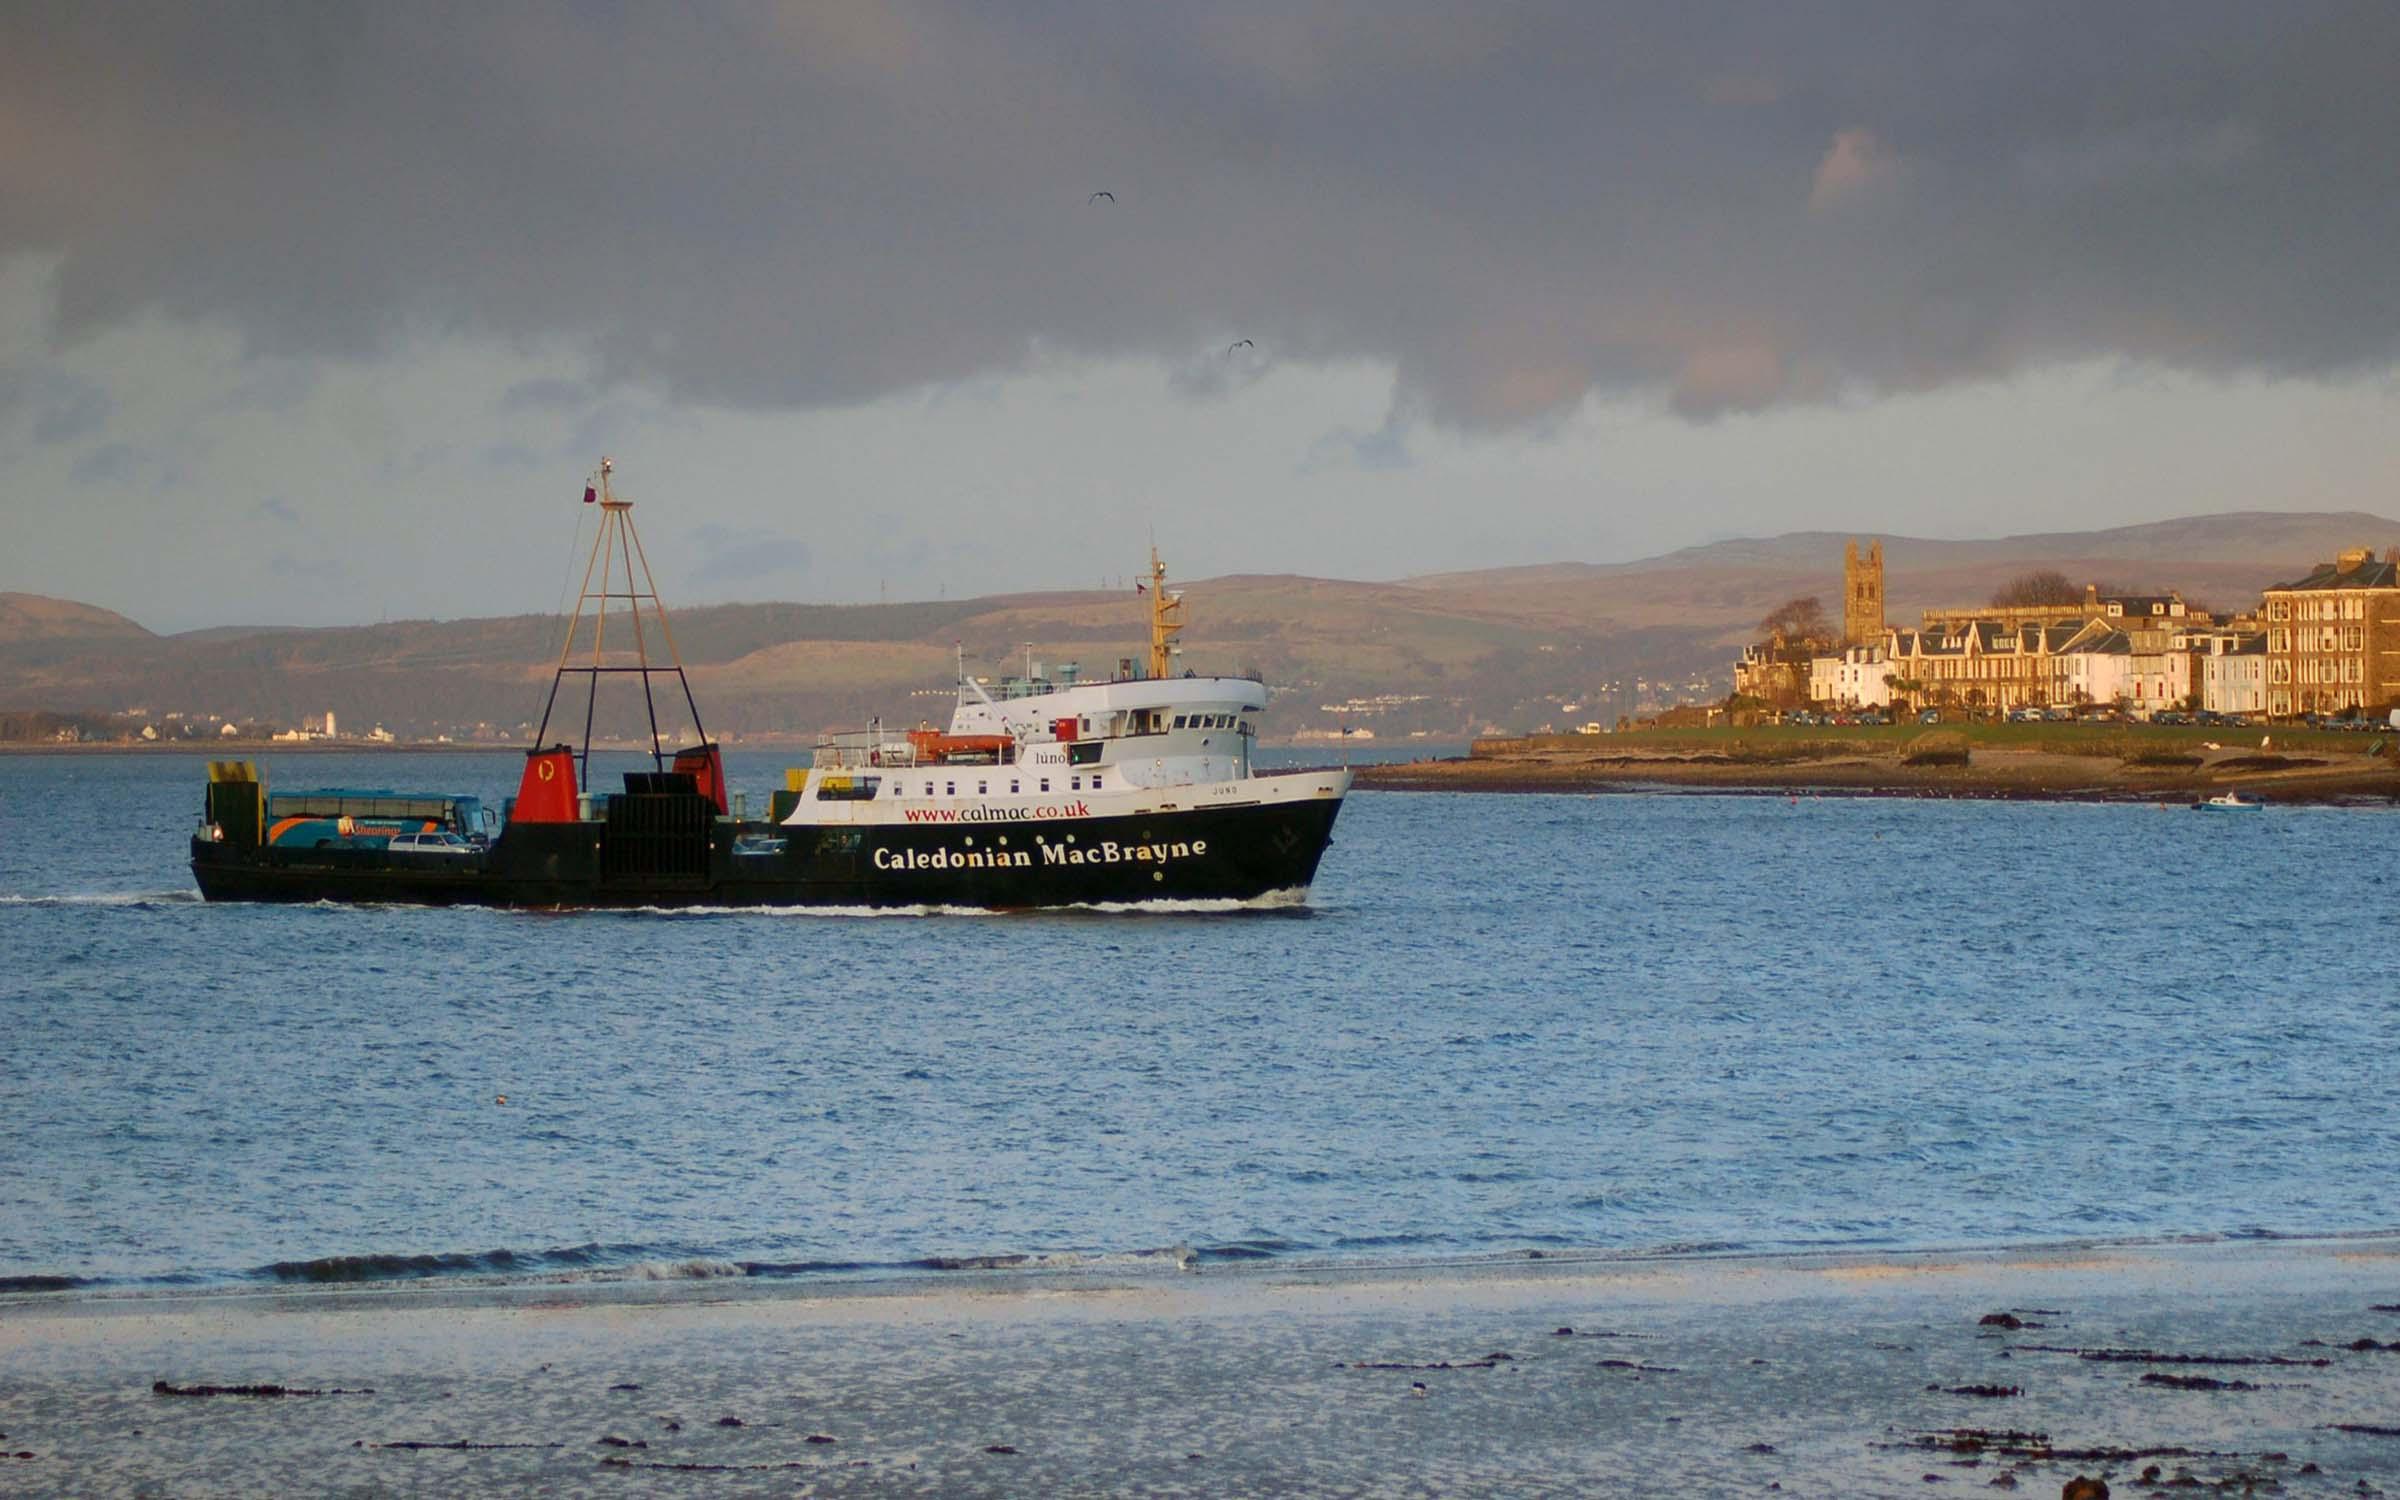 Juno arriving at Rothesay (Ships of CalMac)